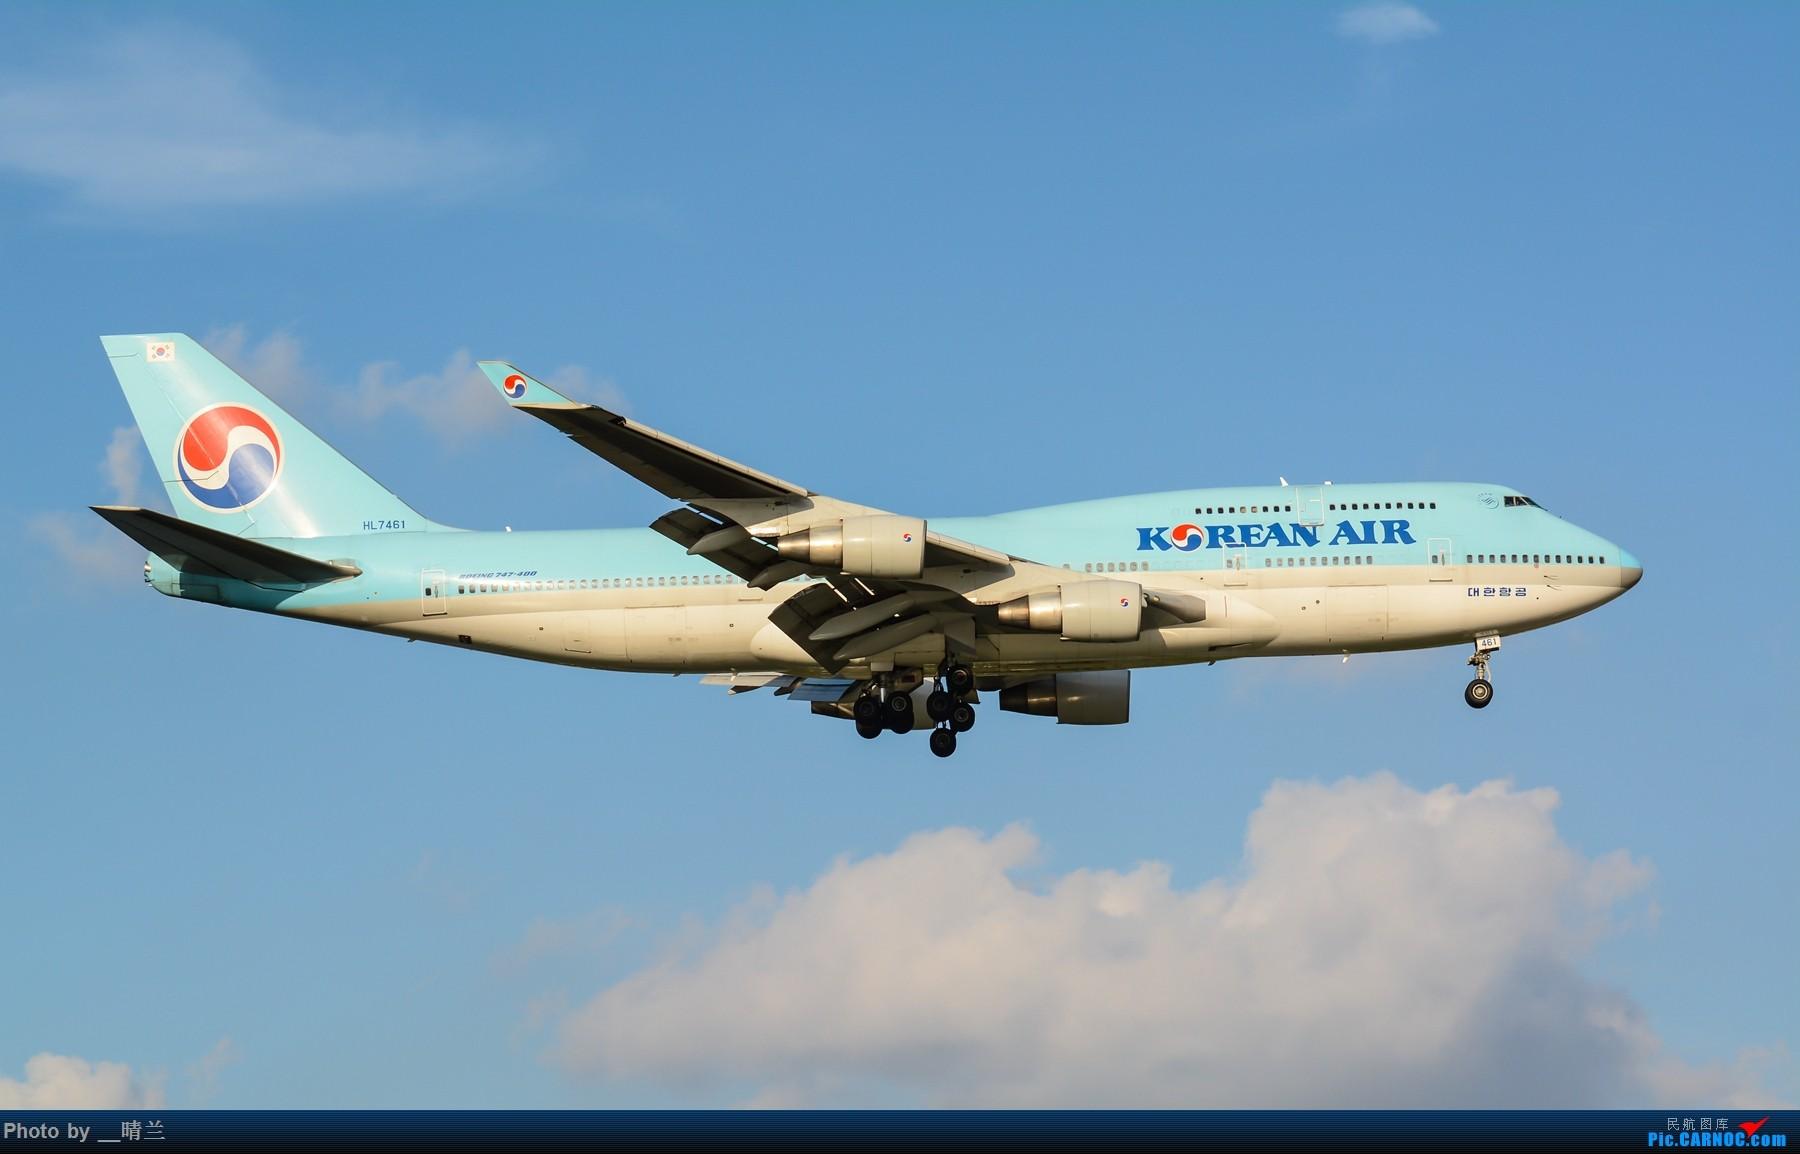 Re:[原创]果然昨天发了图,今天SHA就是大蓝天~~最开心的事莫过于基友们一起拍机! BOEING 747-400 HL7461 中国上海虹桥国际机场